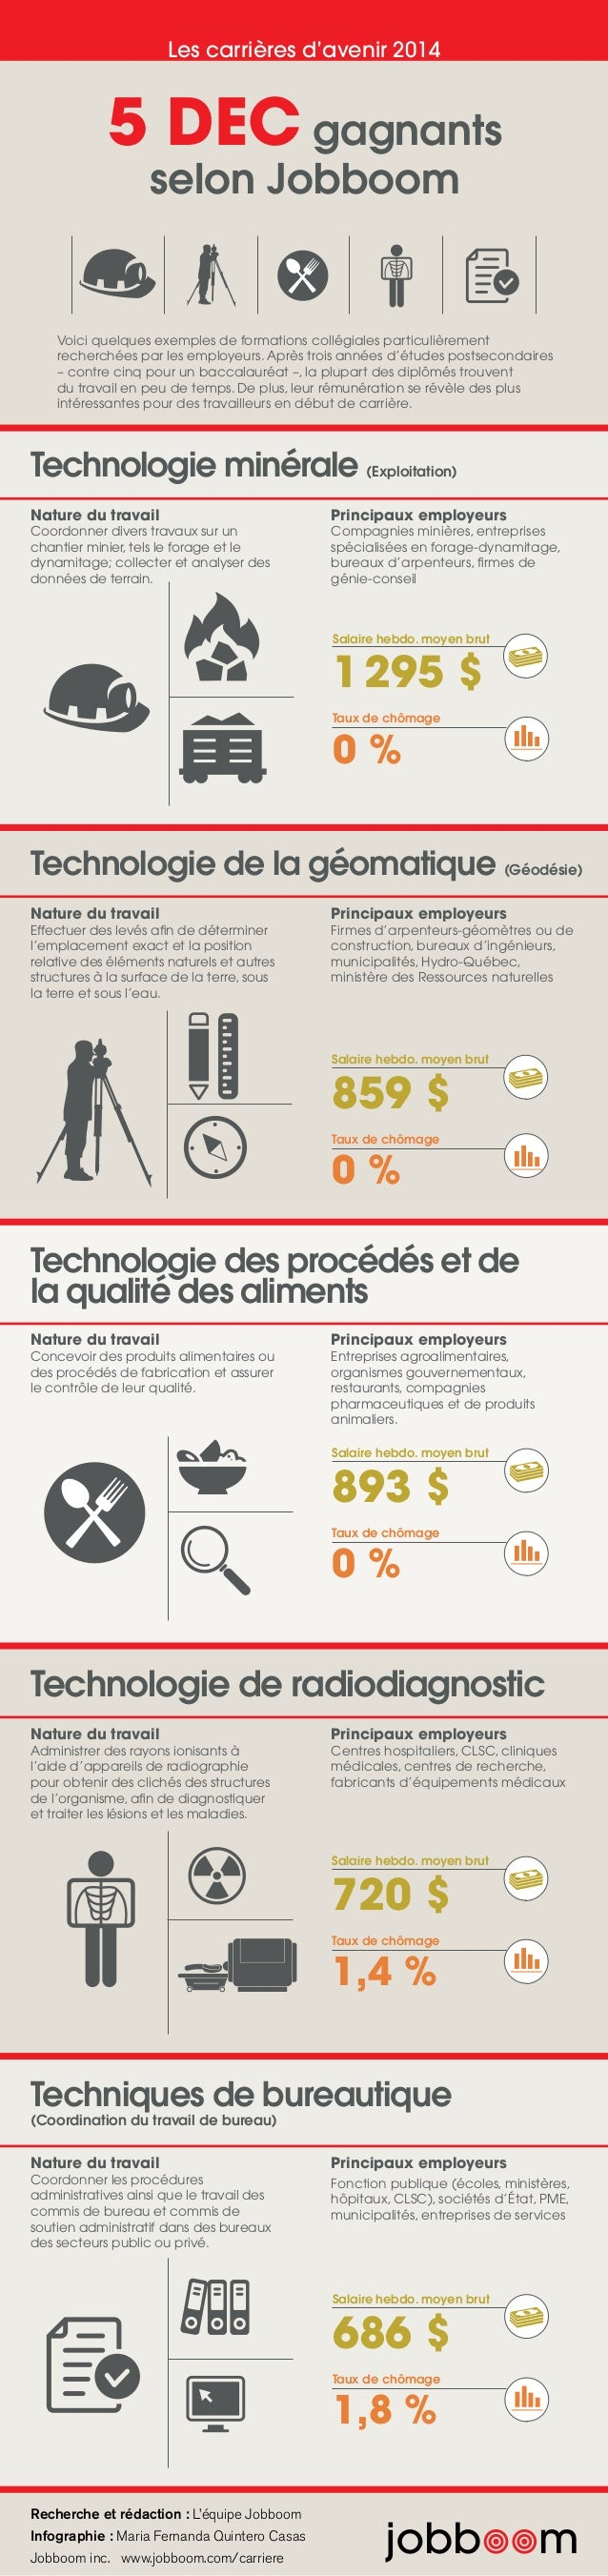 Recherche et rédaction : L'équipe Jobboom Infographie : Maria Fernanda Quintero Casas Jobboom inc. www.jobboom.com/carrier...